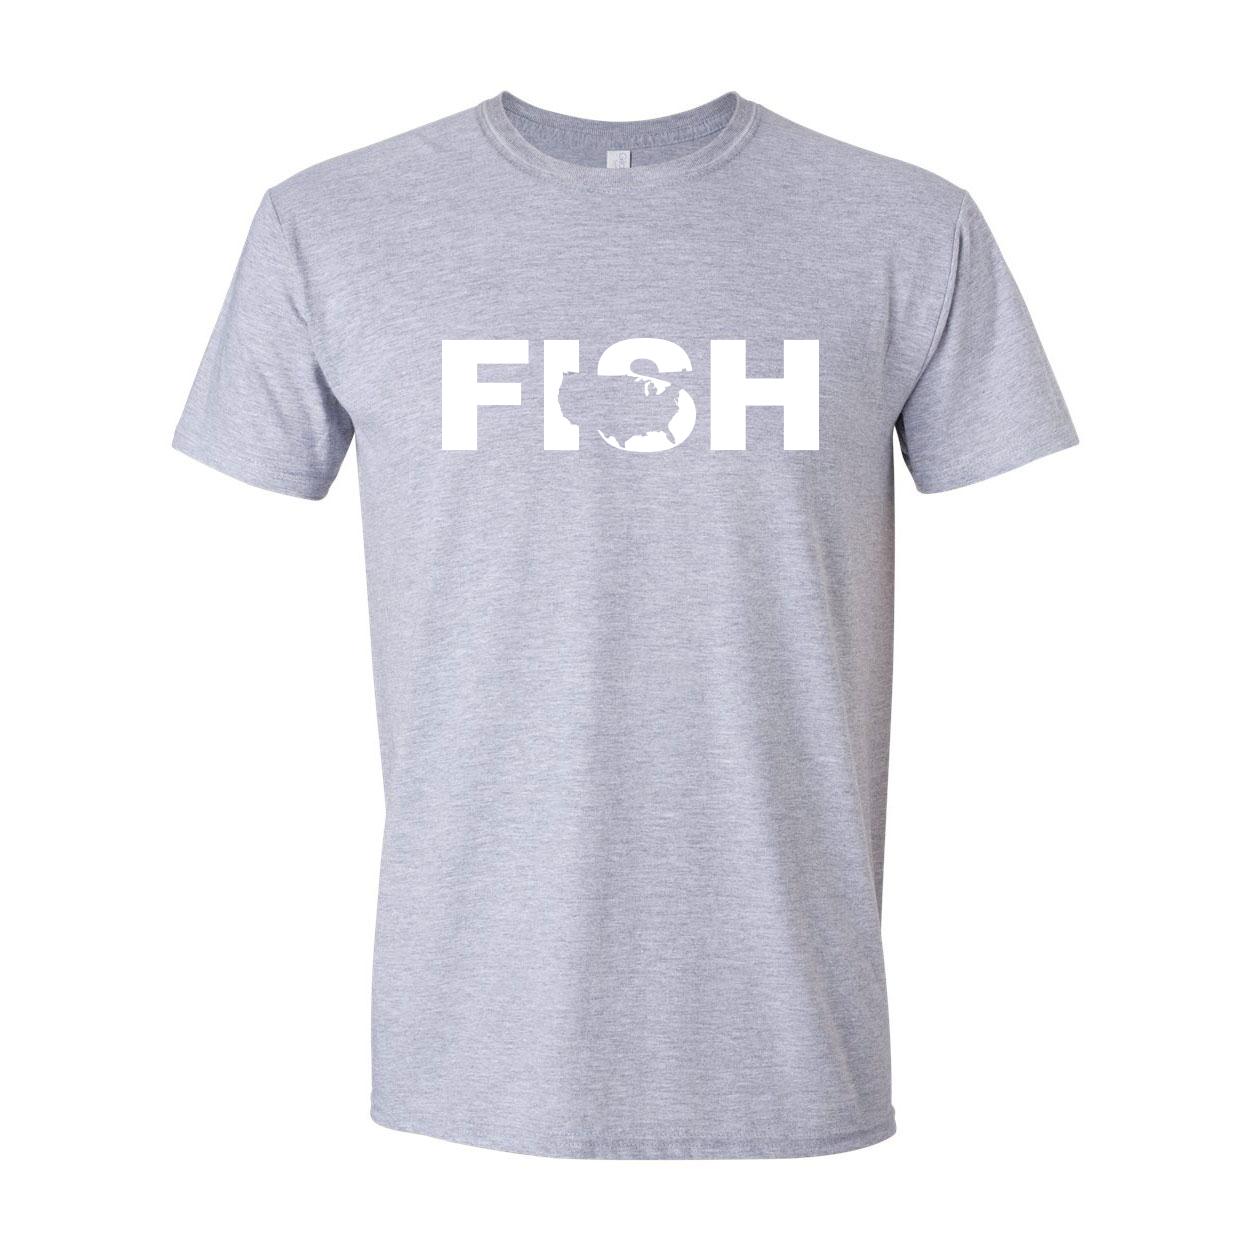 Fish United States Classic T-Shirt Sport Gray (White Logo)